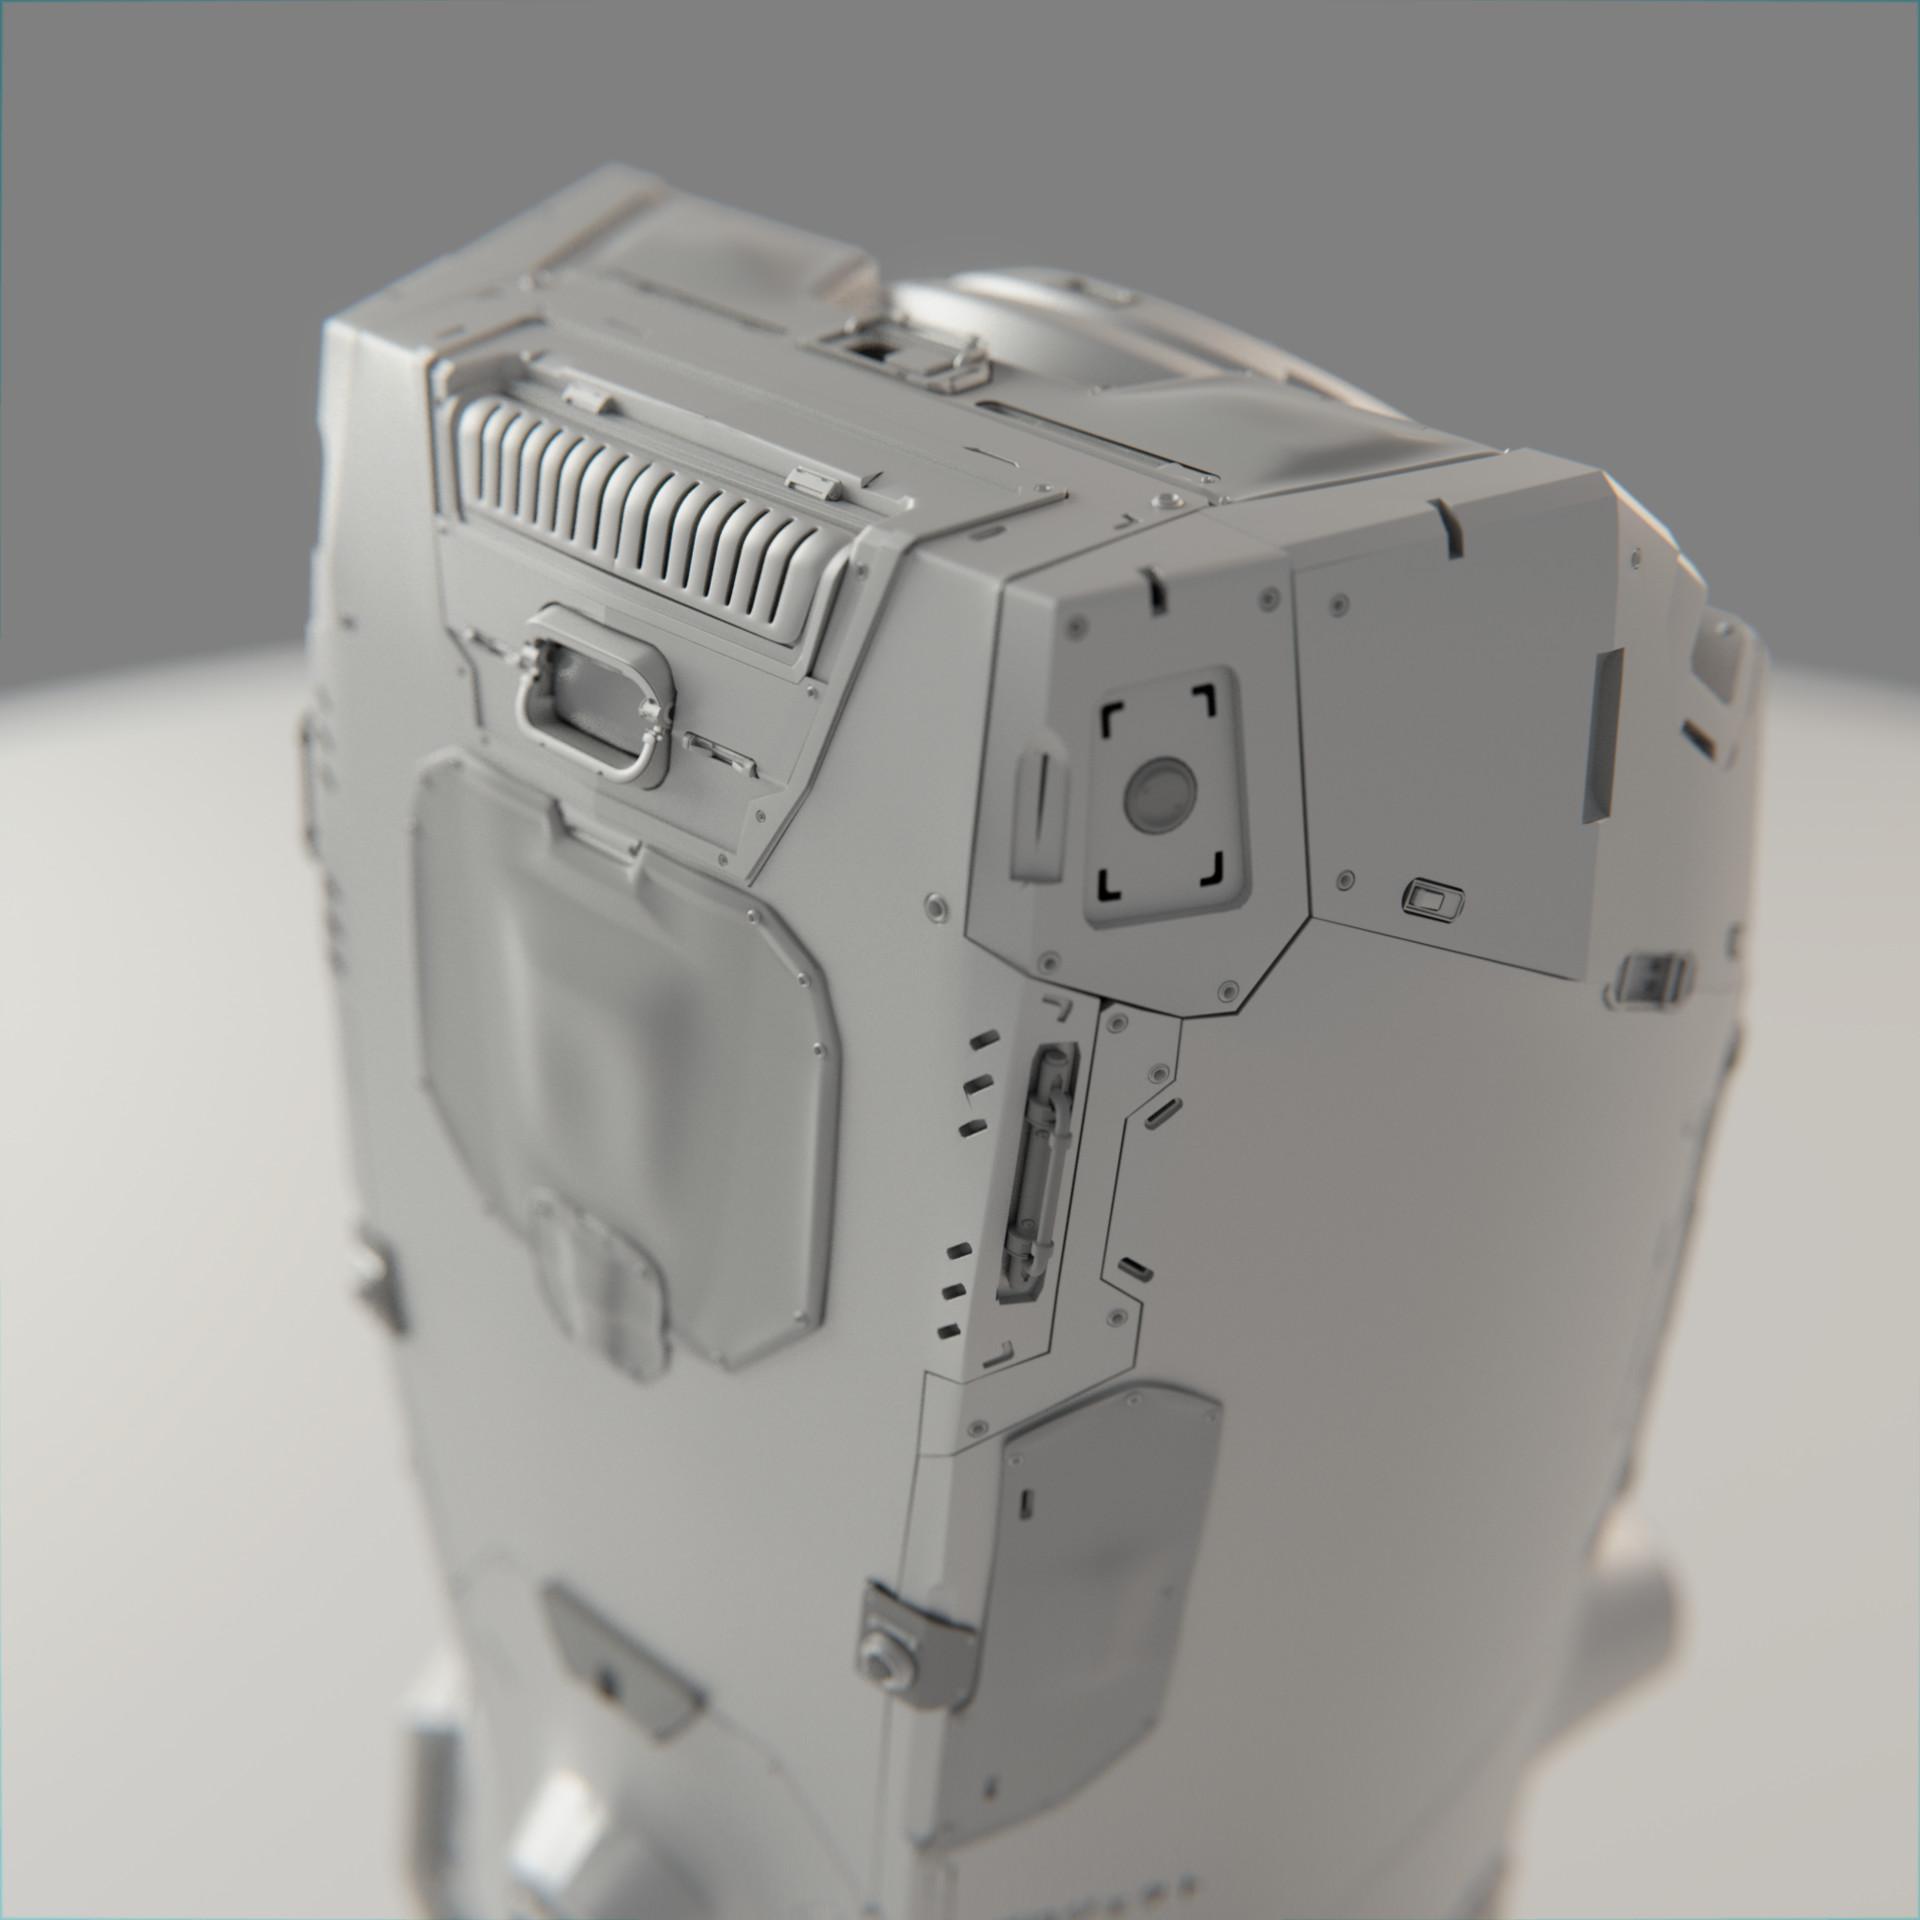 Victor duarte camera 003